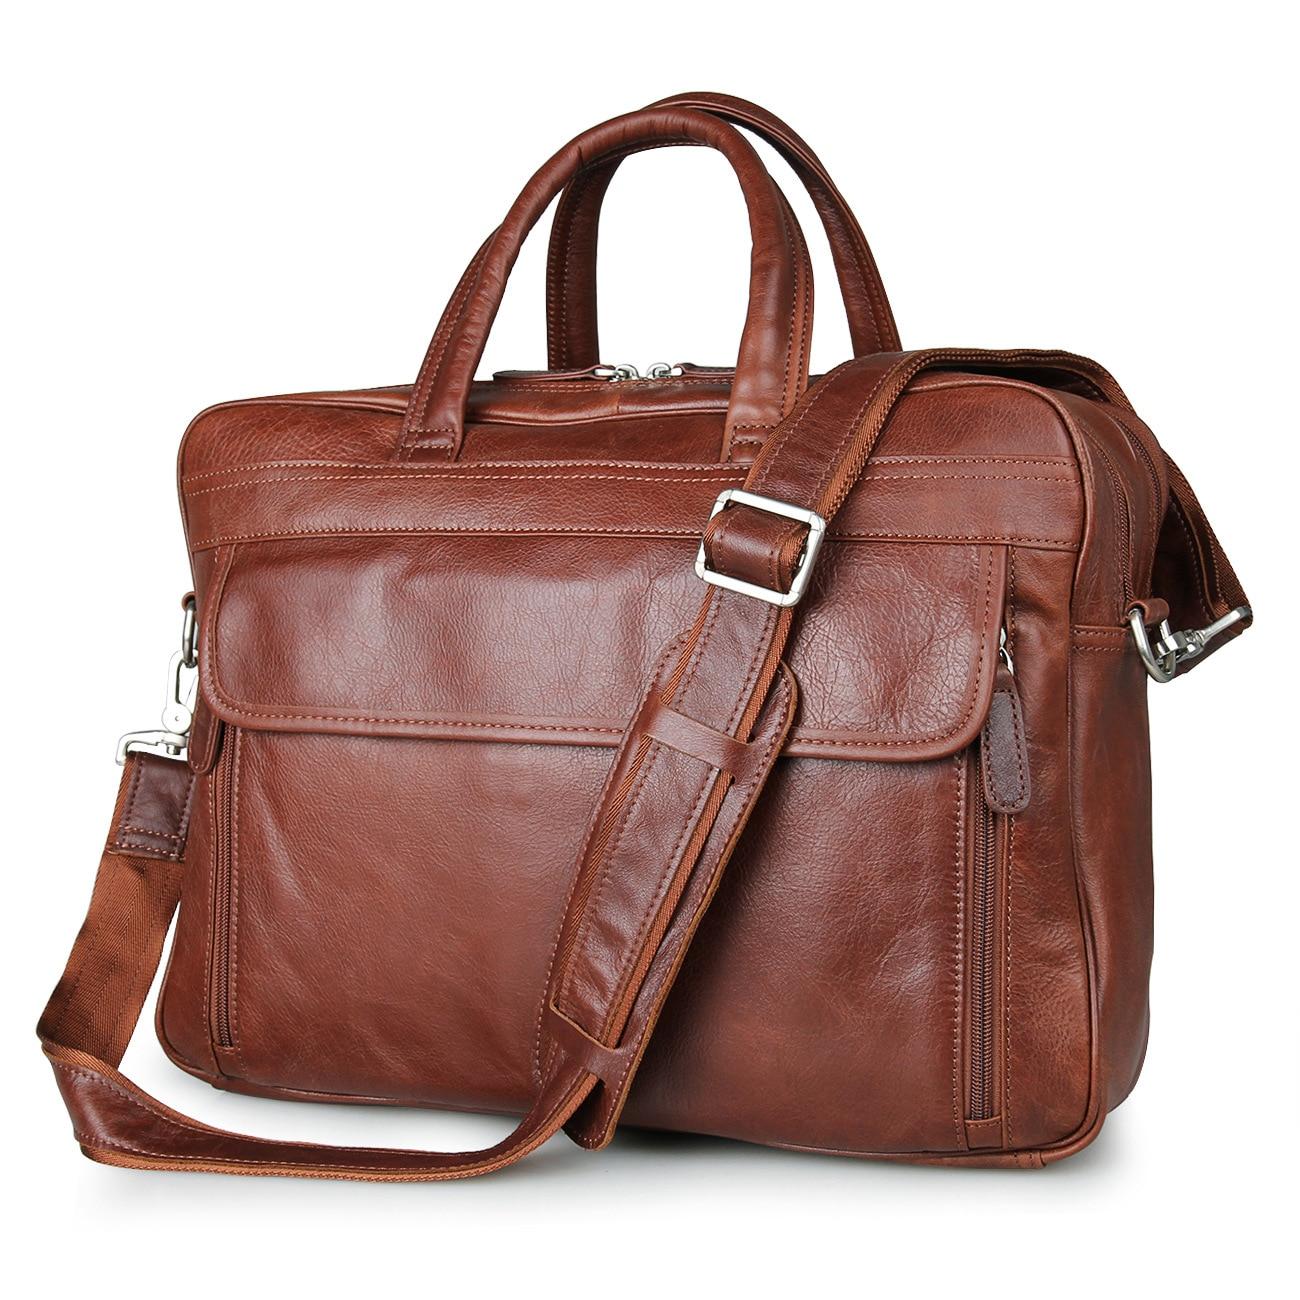 2016 New Arrival Sale Zipper Solid Man Genuine Leather Bags Mens Business Briefcase Laptop Bag Men Messenger Handbag Totes Cow <br><br>Aliexpress